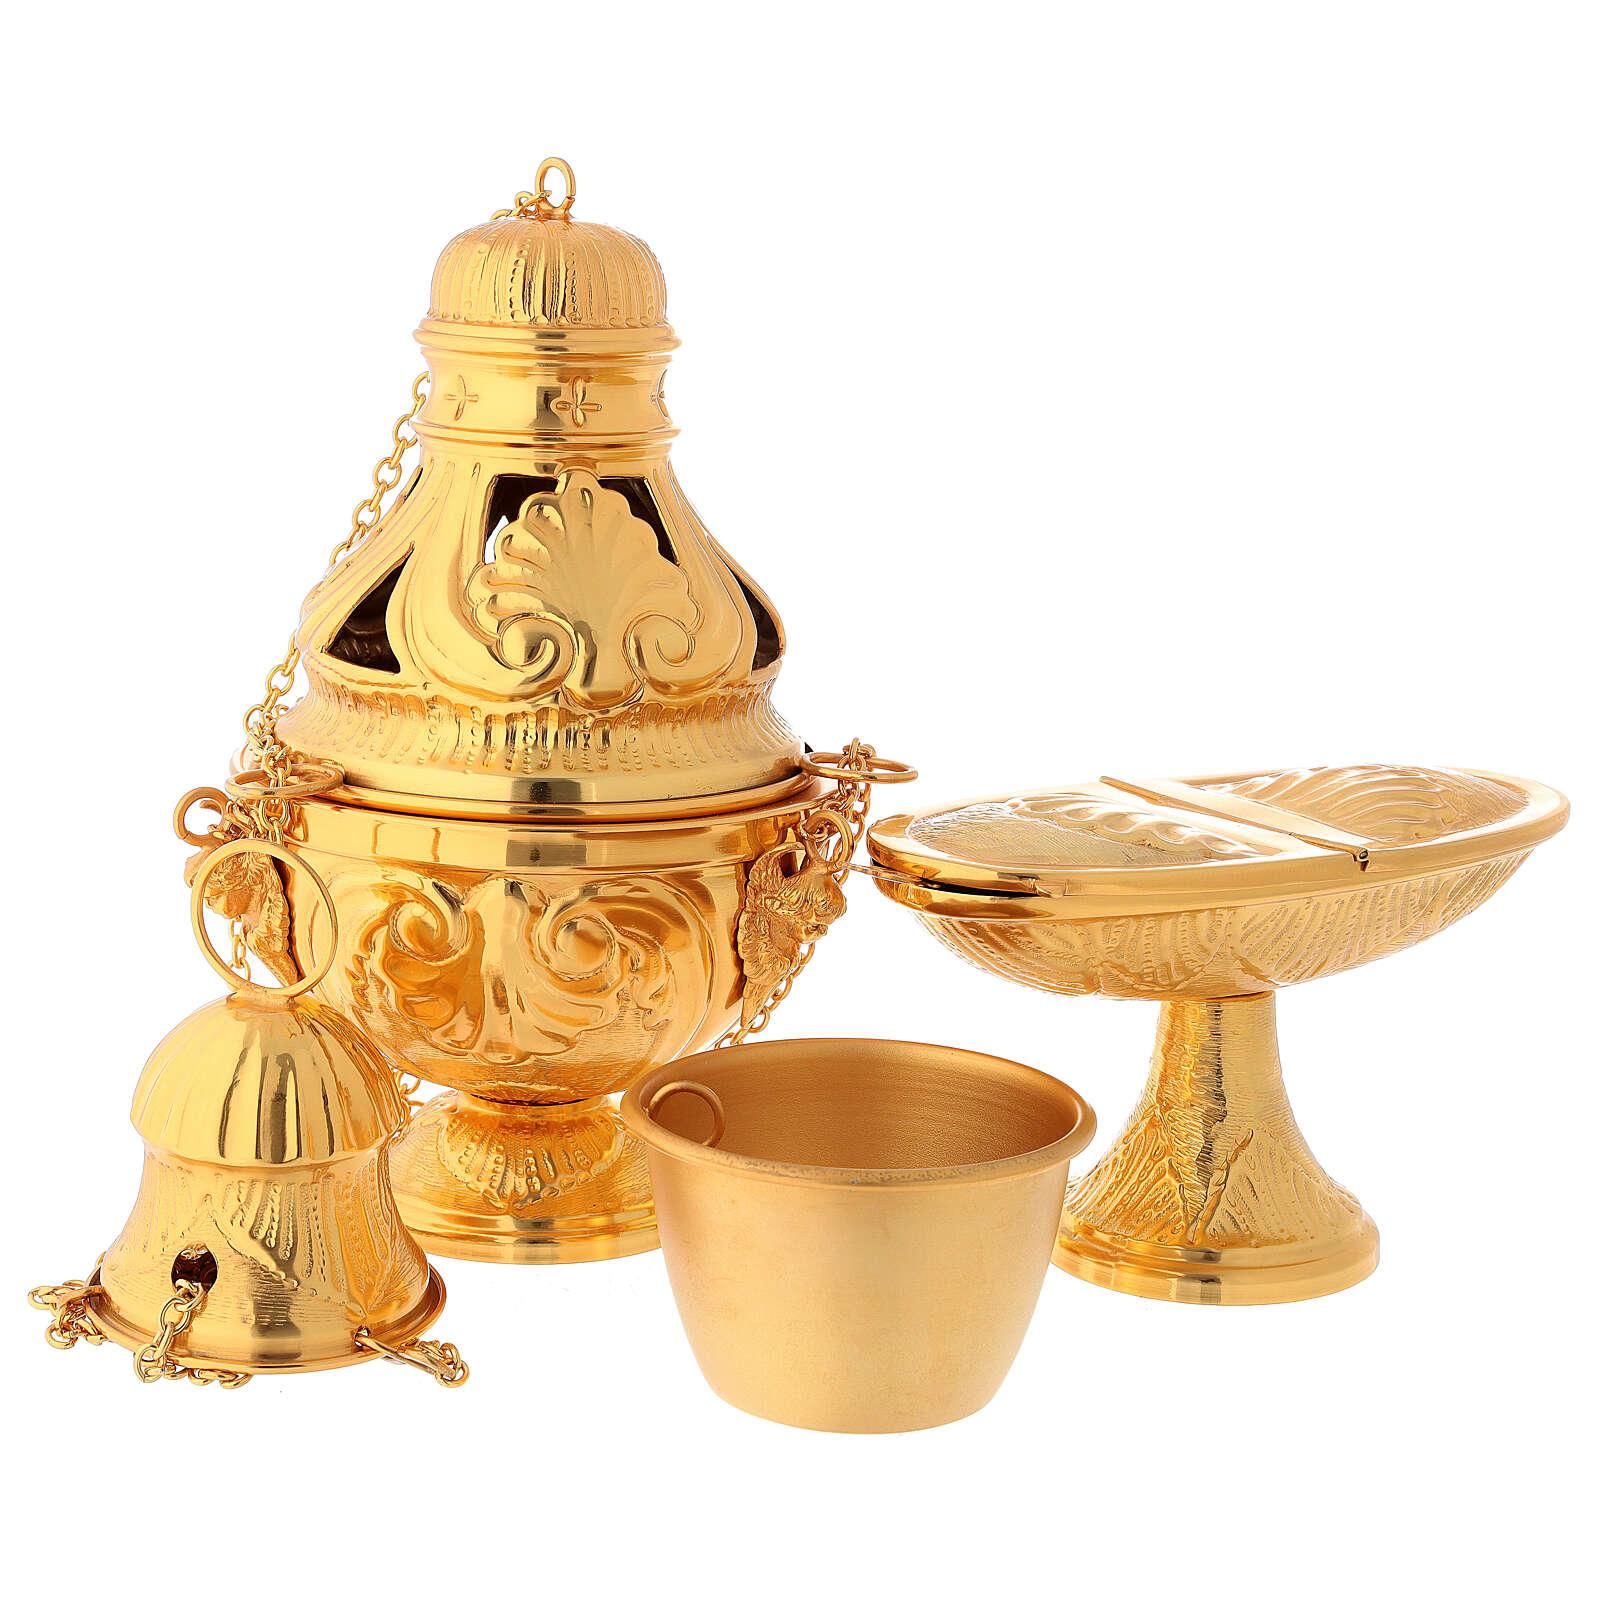 Servicio incensario naveta cucharilla latón dorado cincelado 3